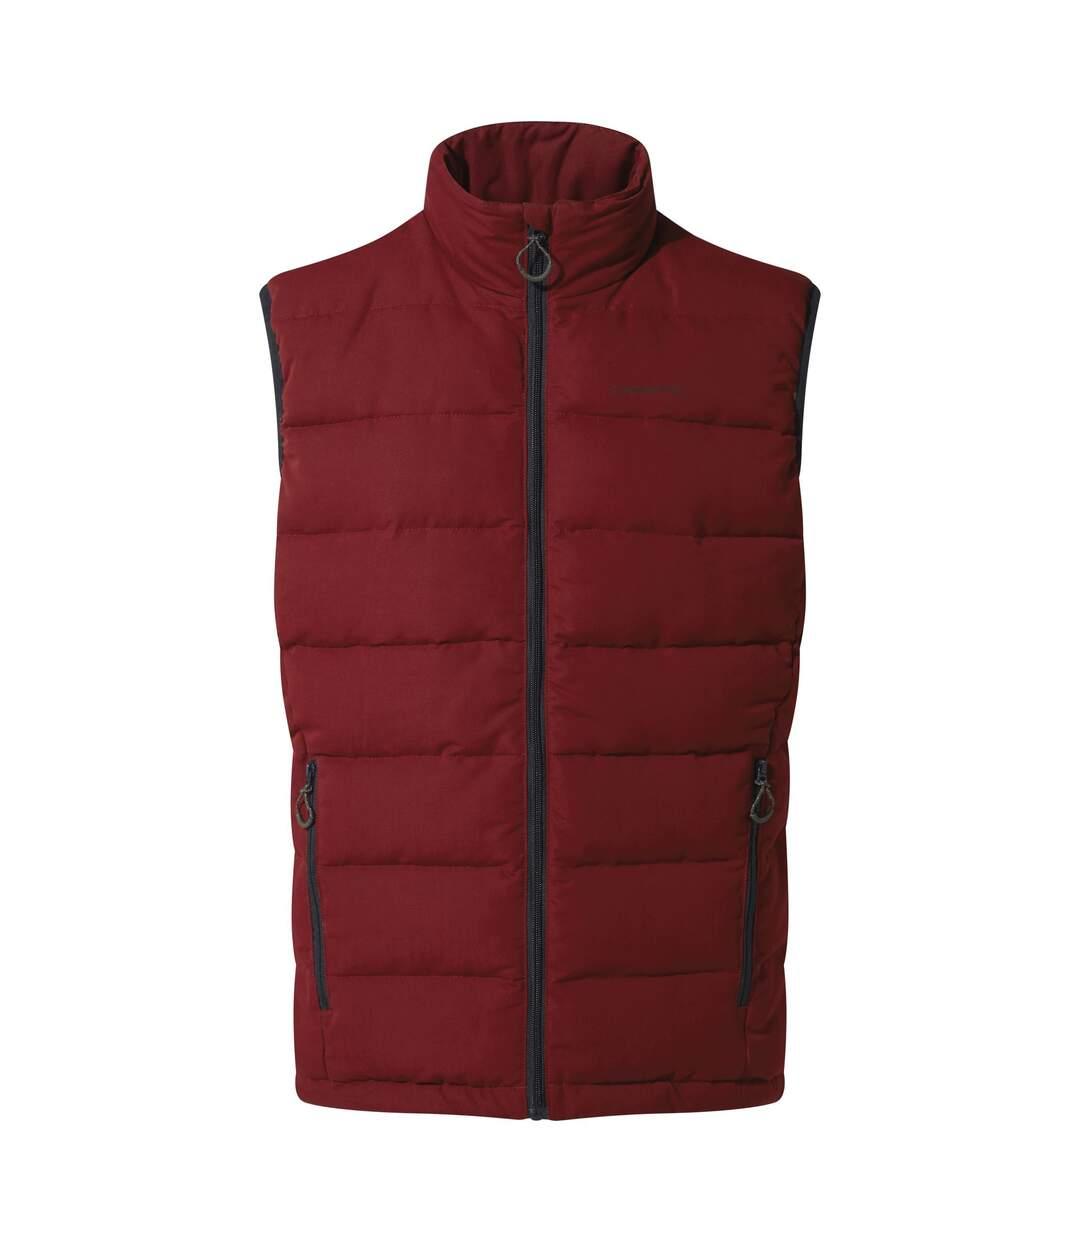 Craghoppers Mens Eldrick Downlike Vest (Firth Red/Platinum/Black) - UTCG1036